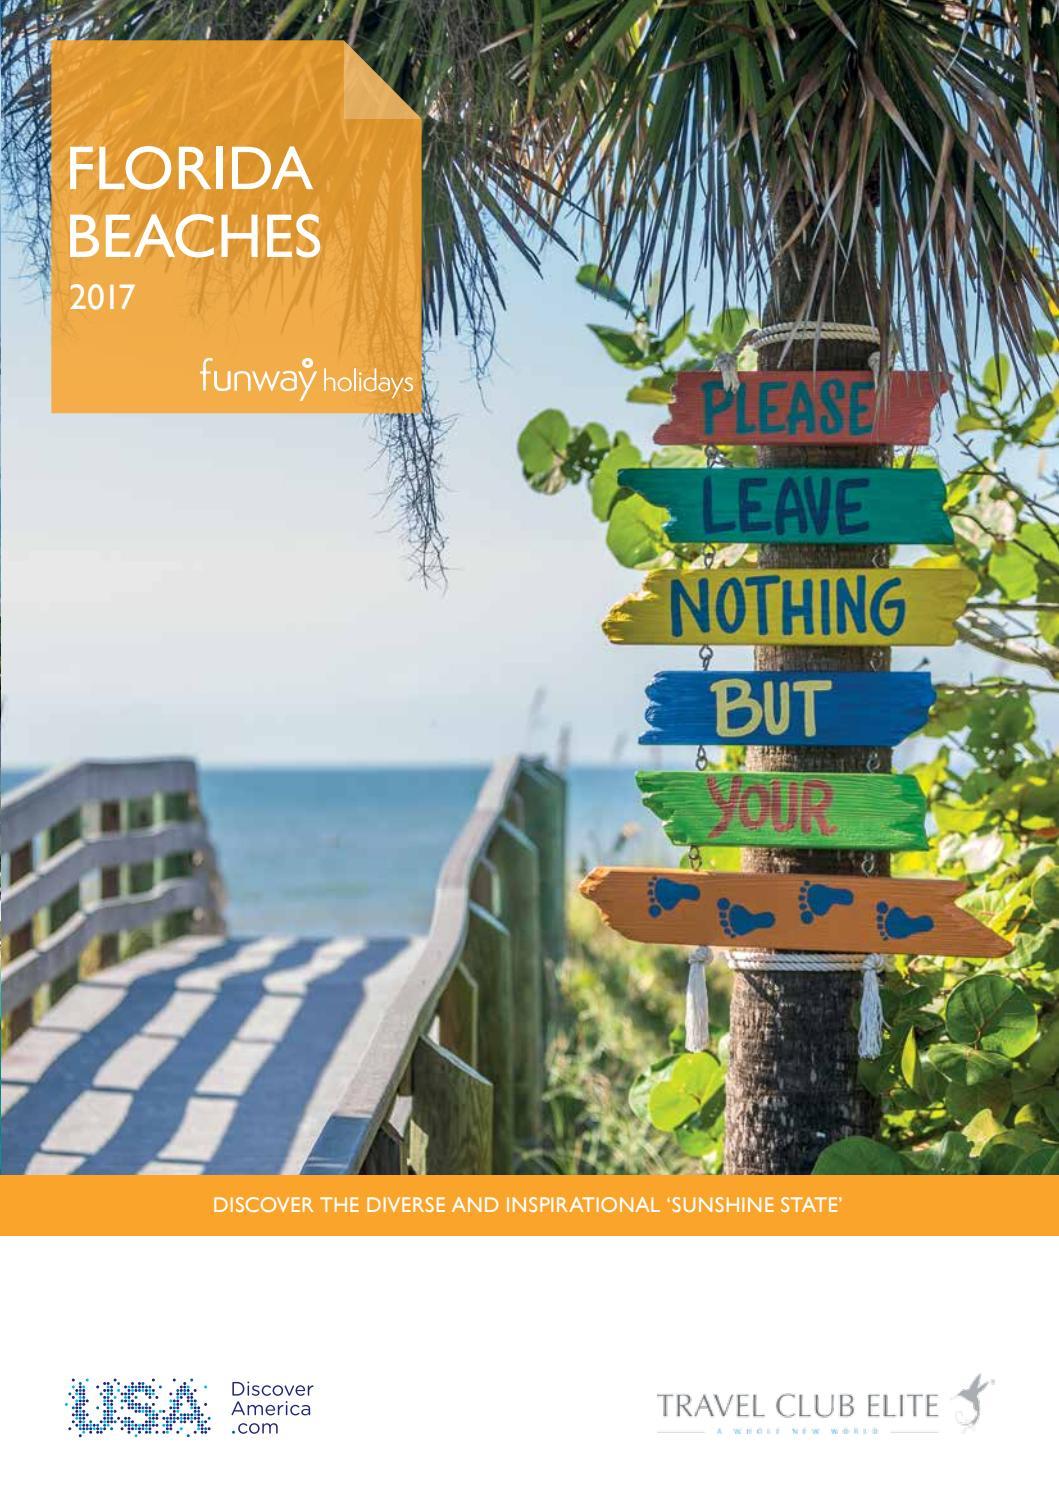 Florida Beaches Brochure Travel Club